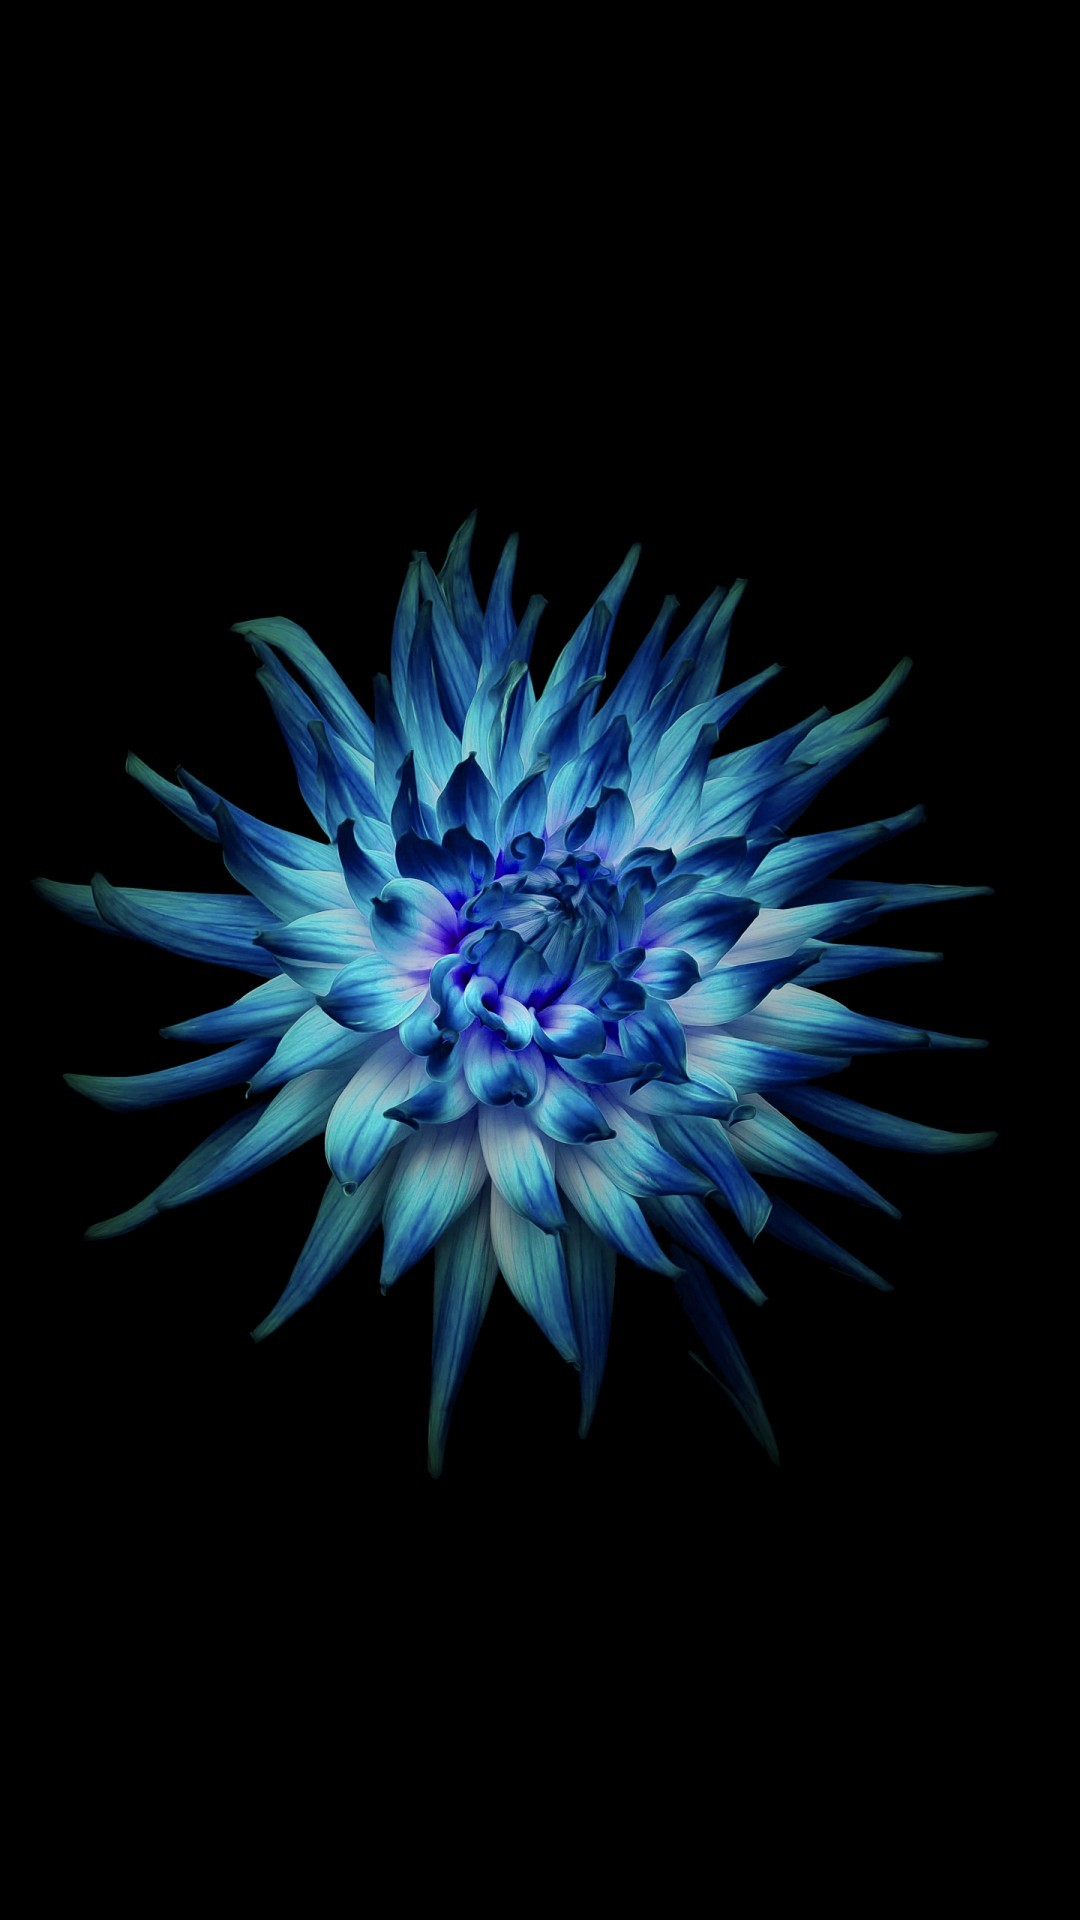 Free Flower in Dark background phone wallpaper by rachelspillane